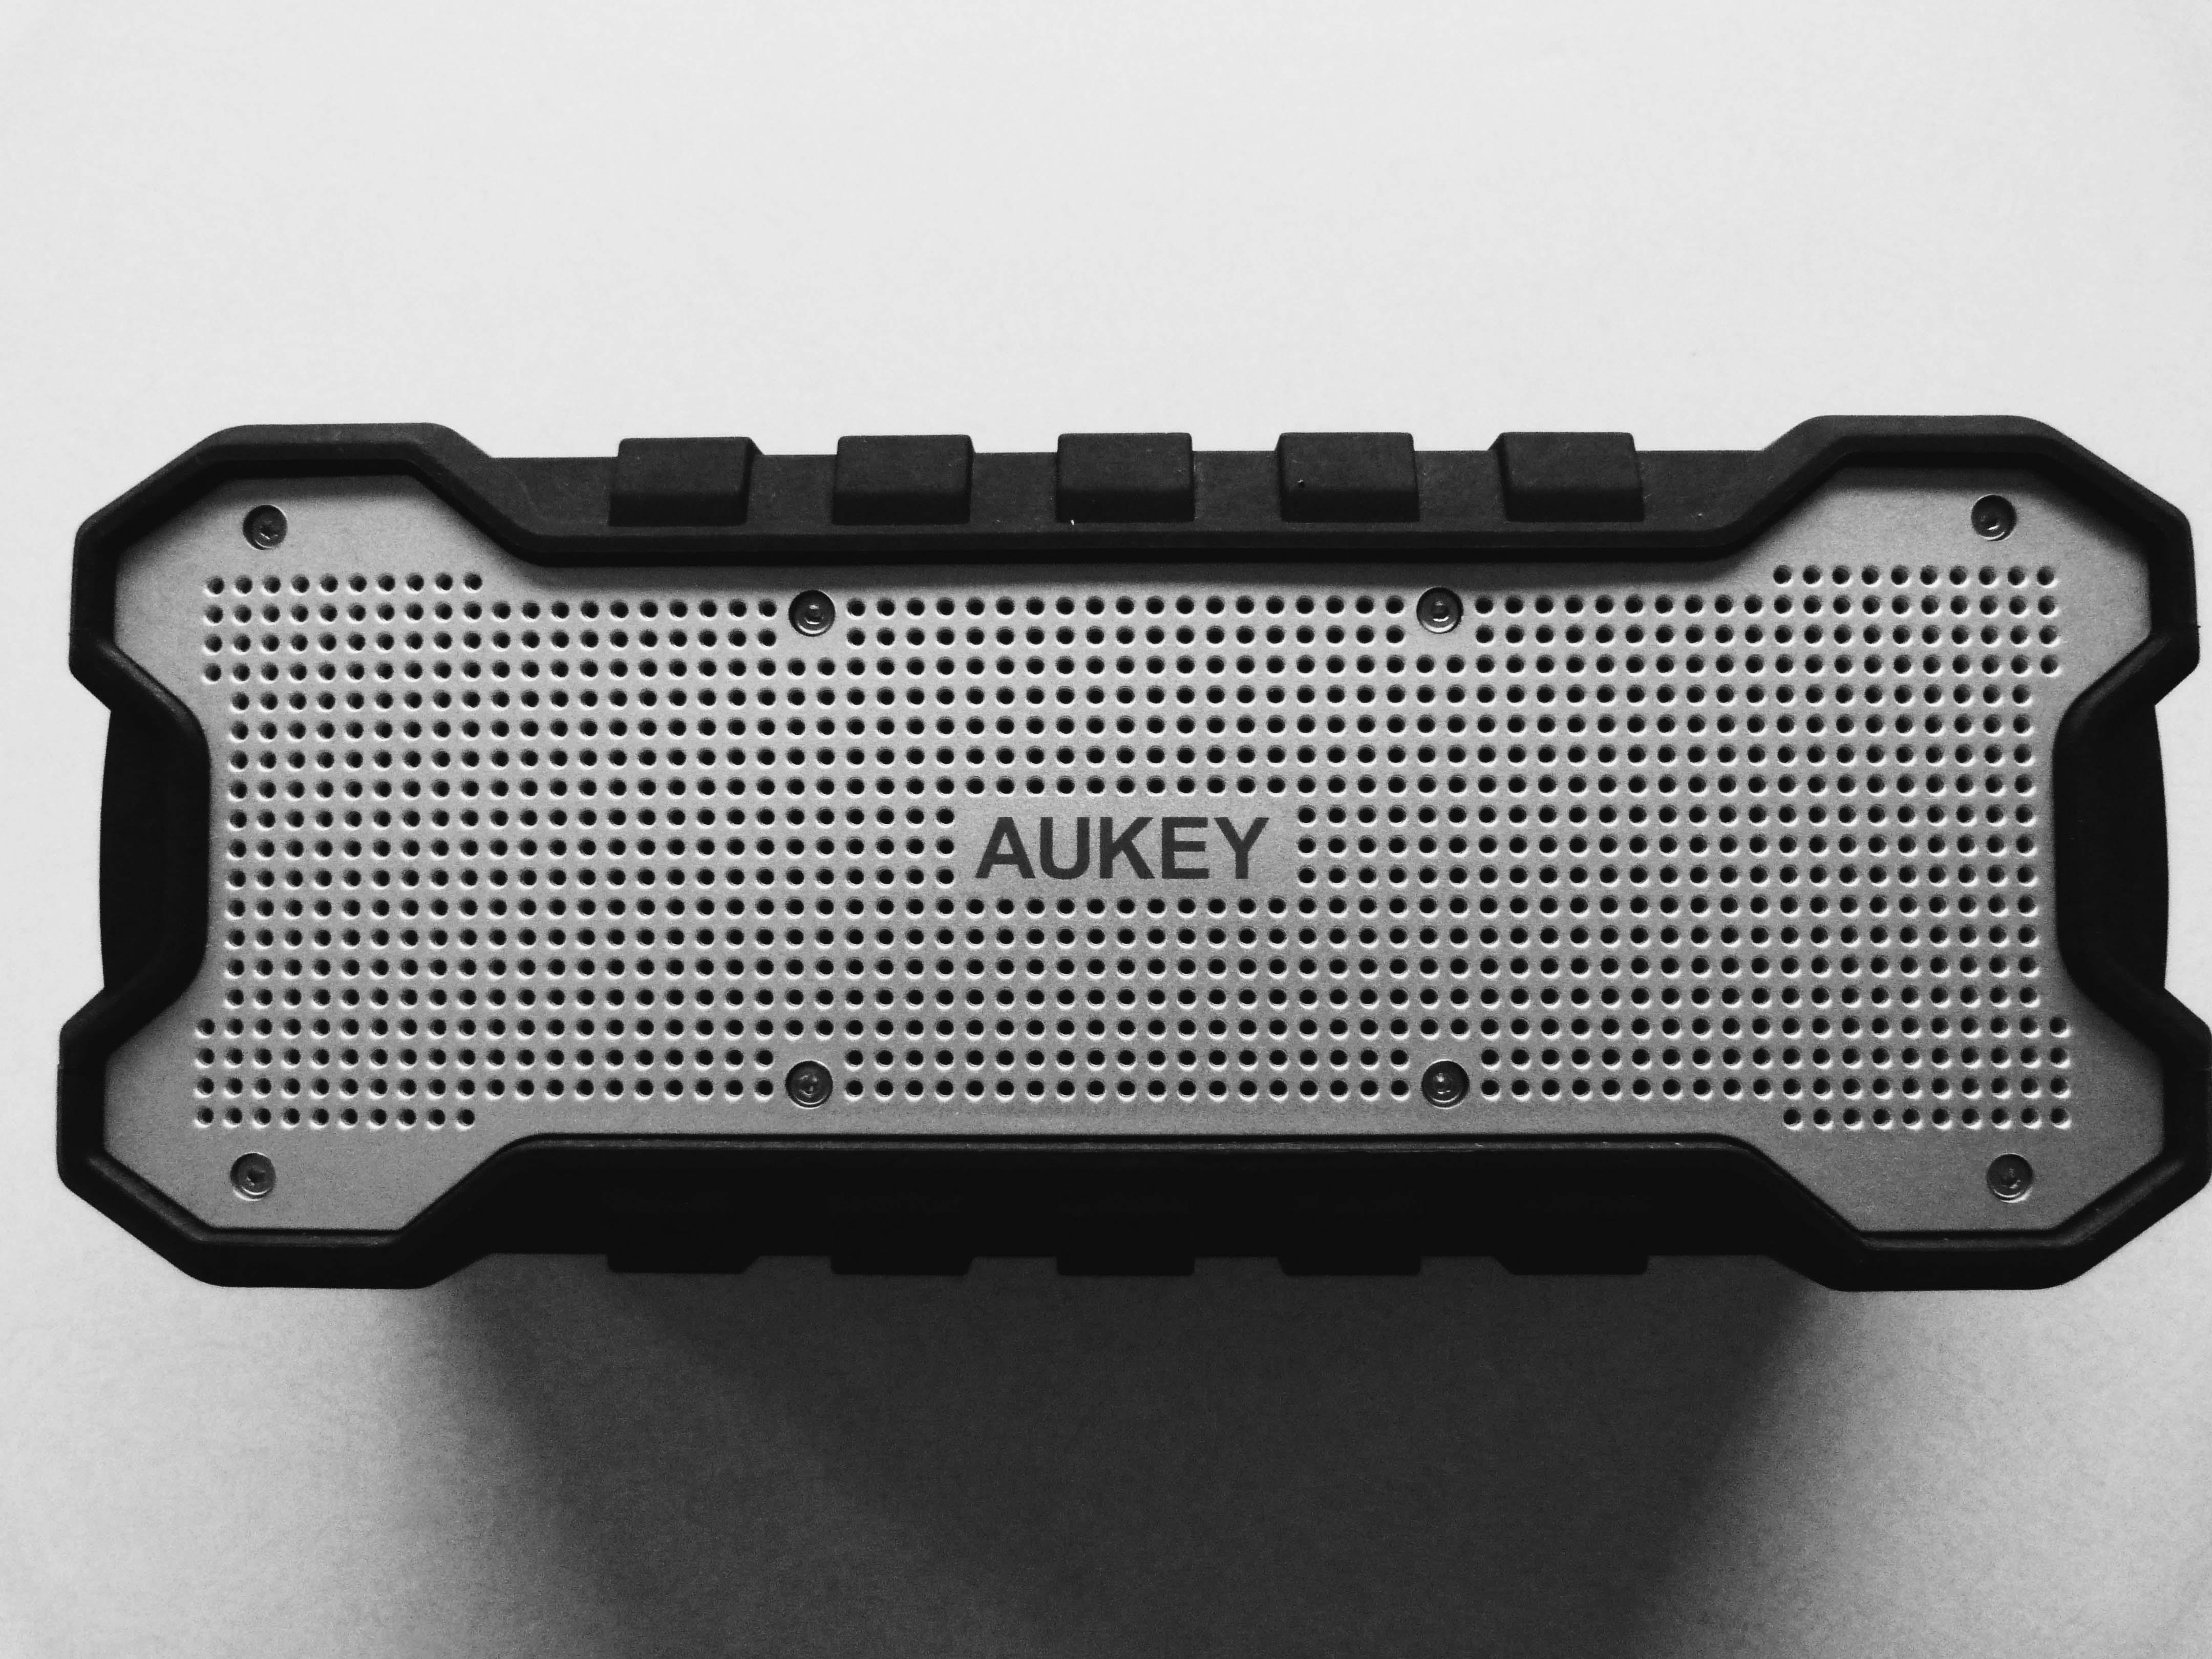 aukey_bluetooth_speaker05